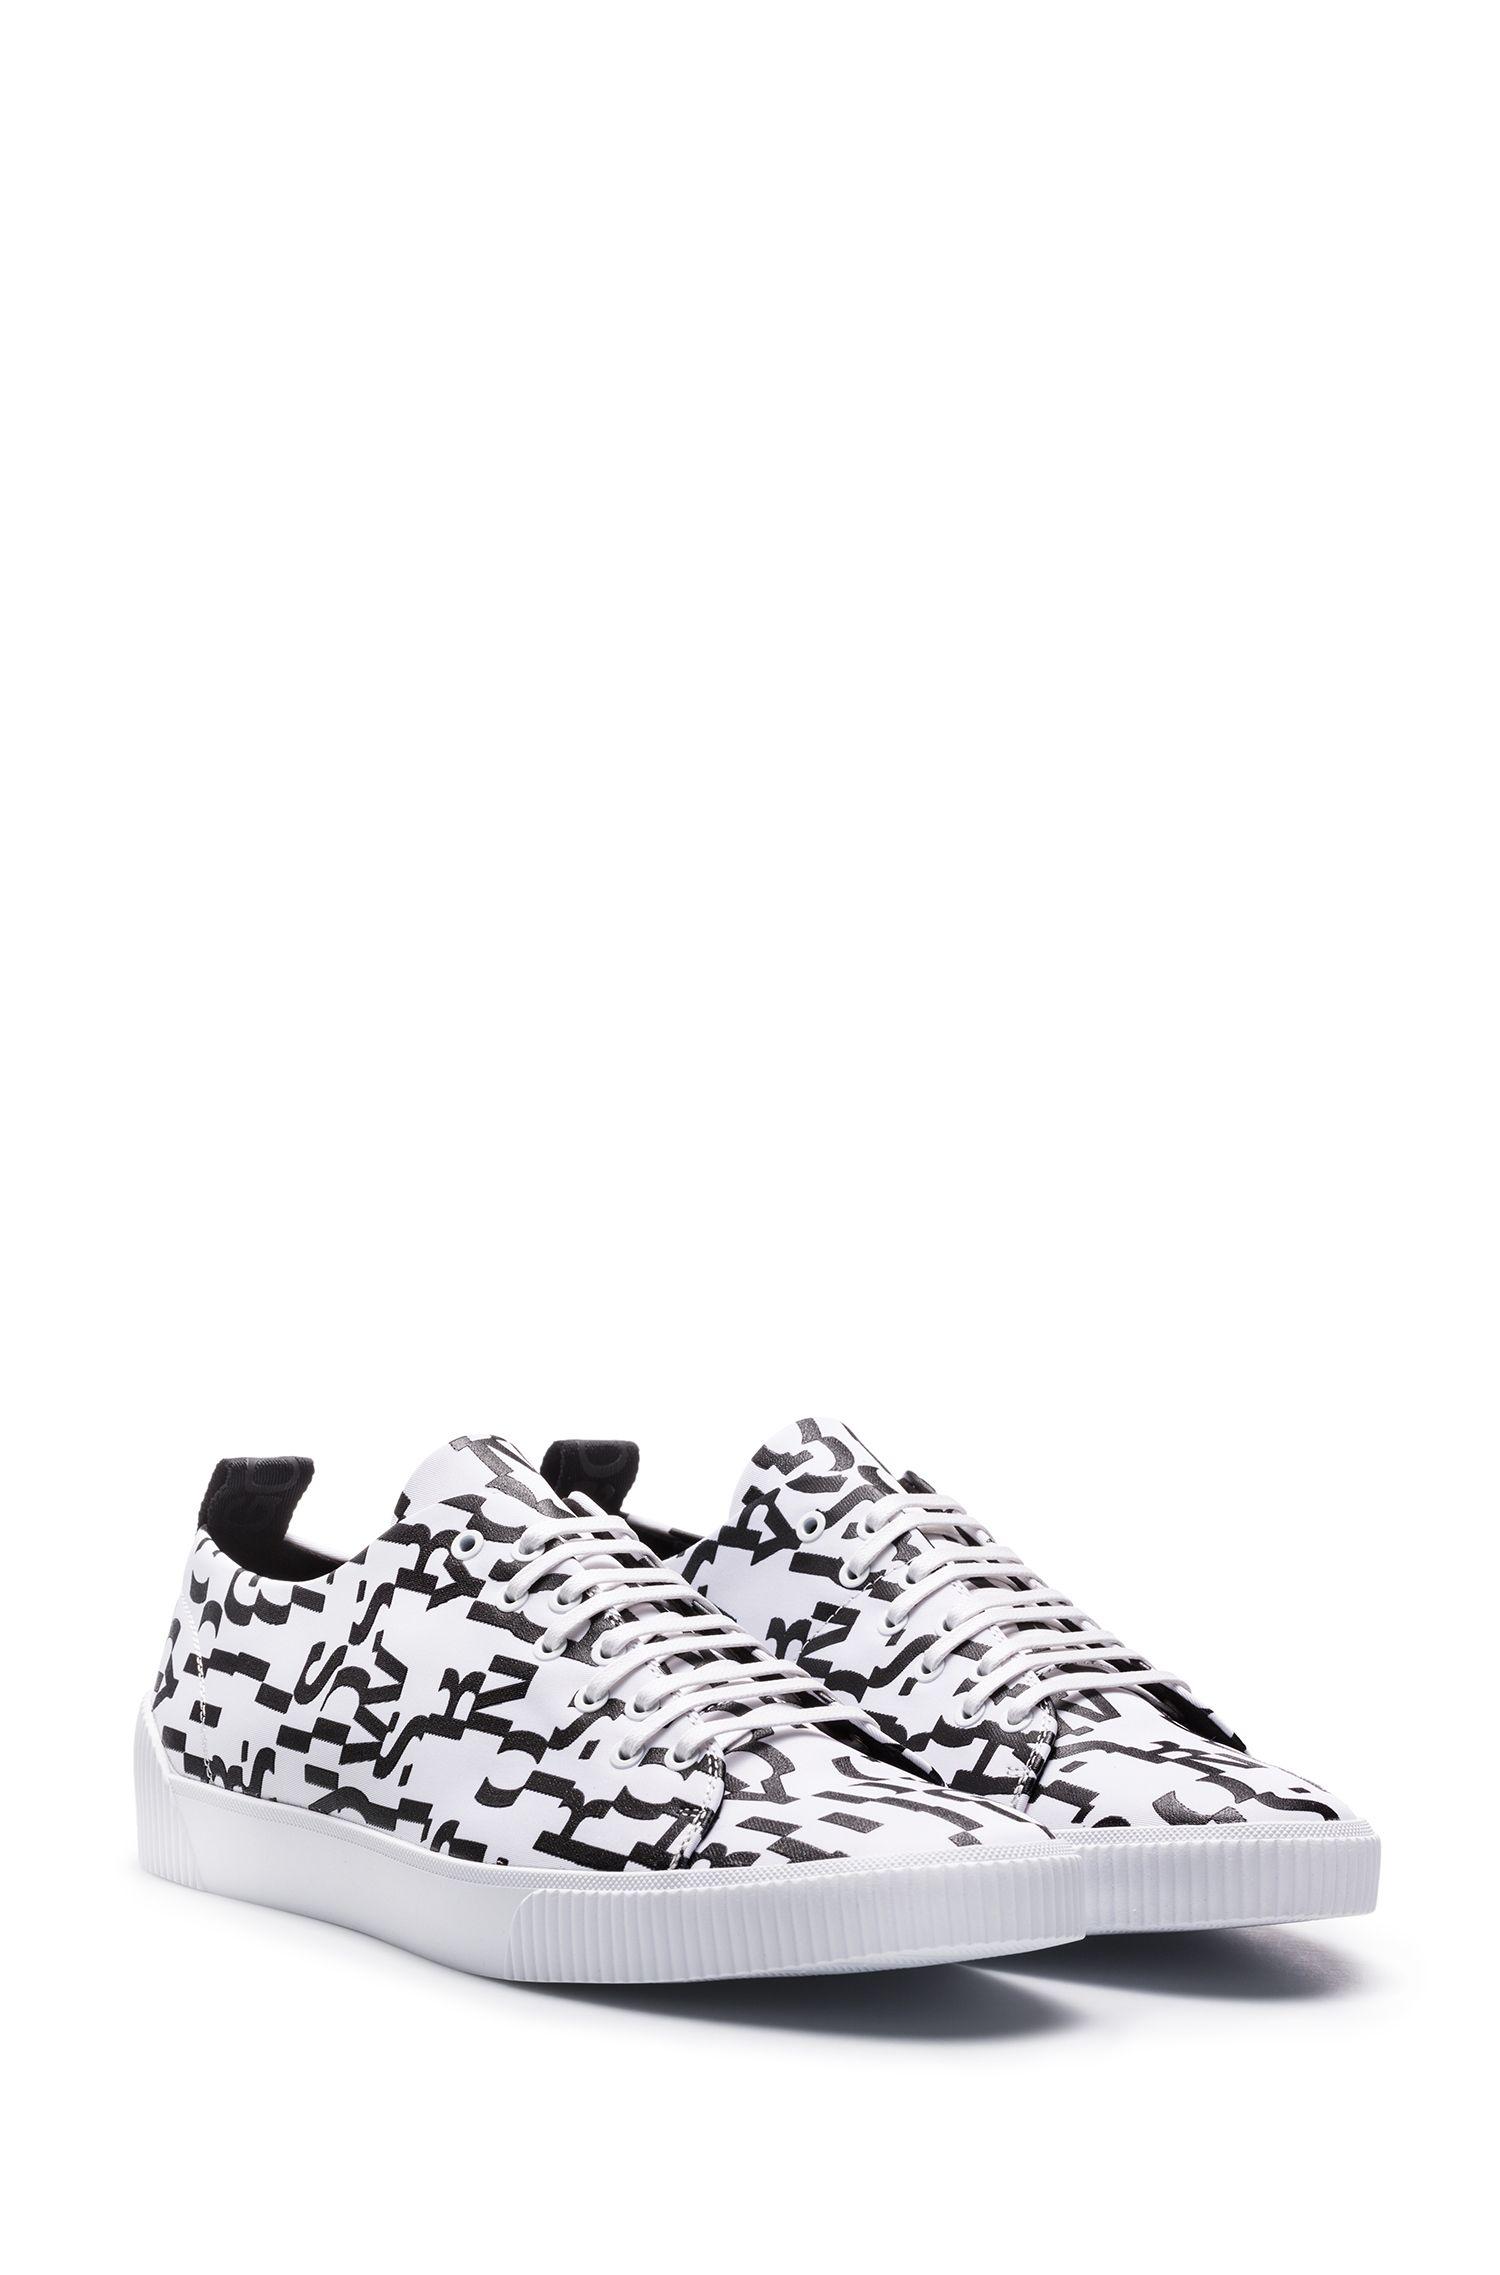 Sneakers aus Material-Mix mit Saison-Print, Weiß